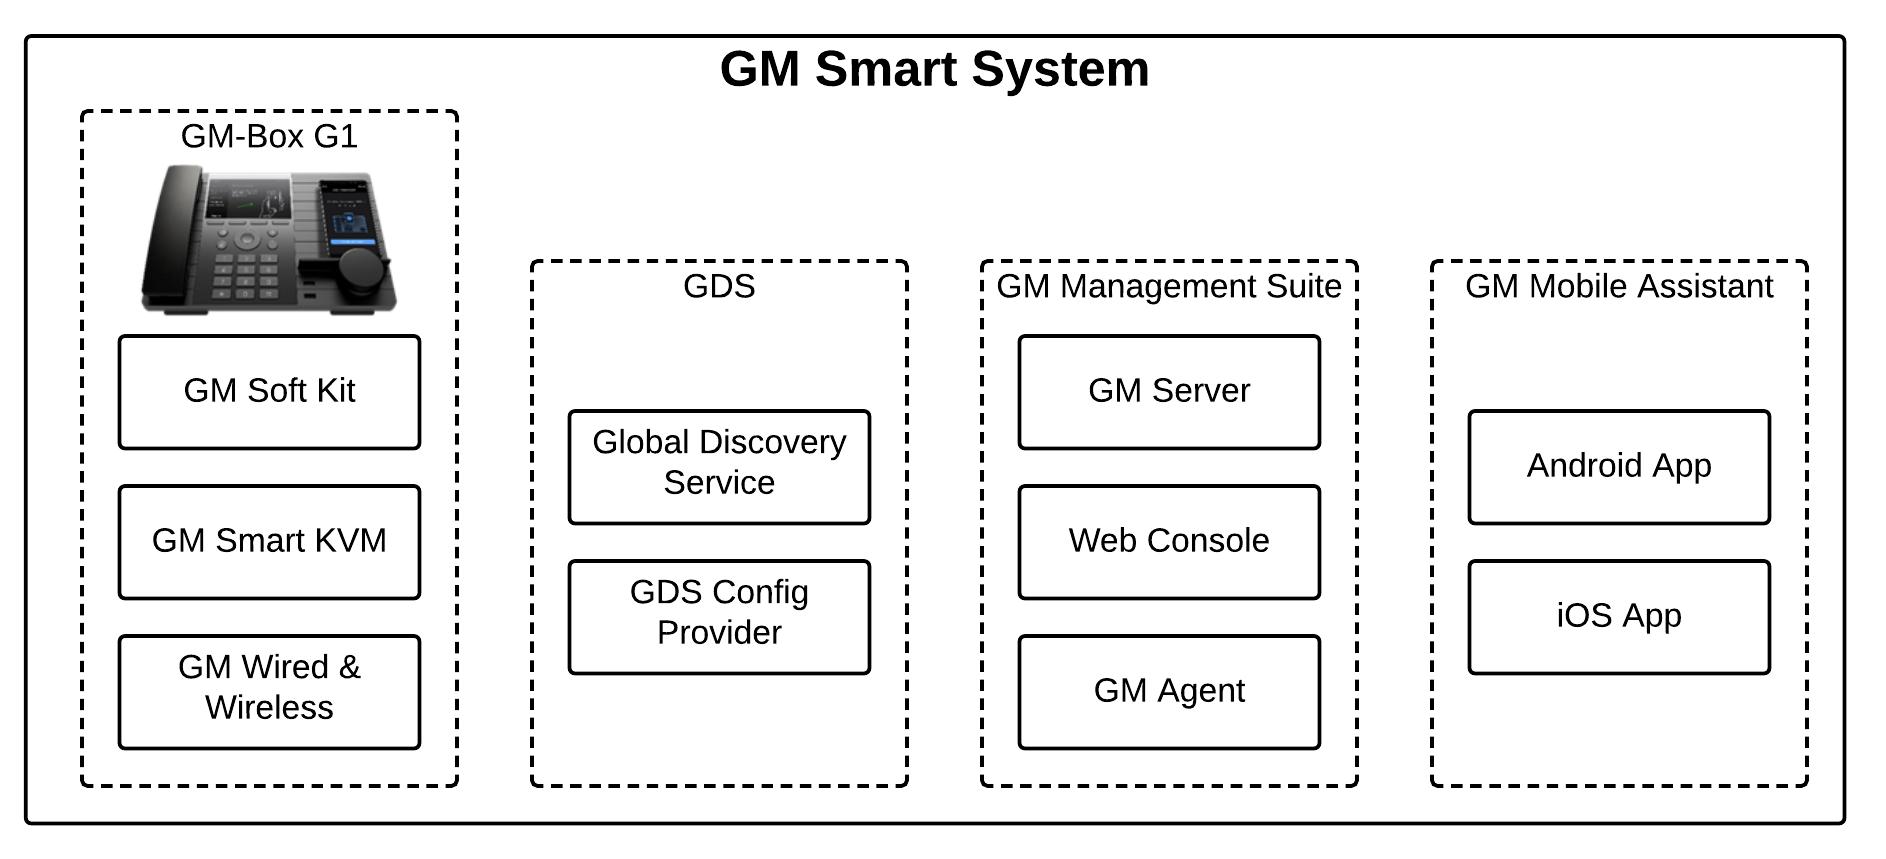 Компоненты платформы GM Smart System